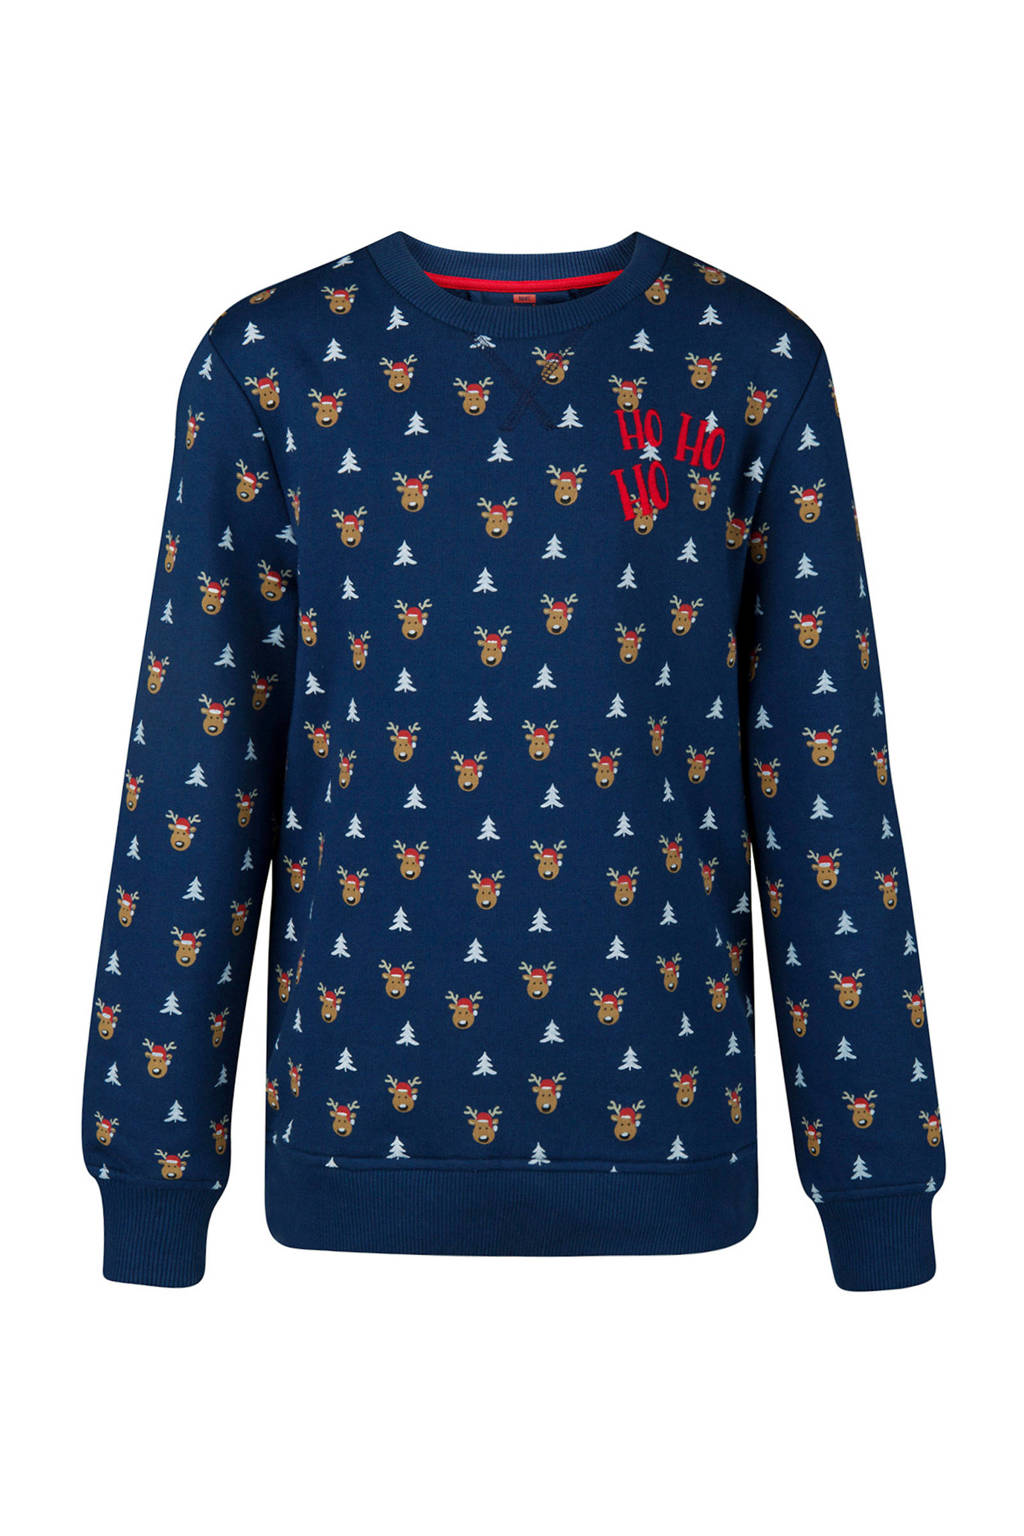 WE Fashion kerst sweater met alloverprint blauw, Blauw